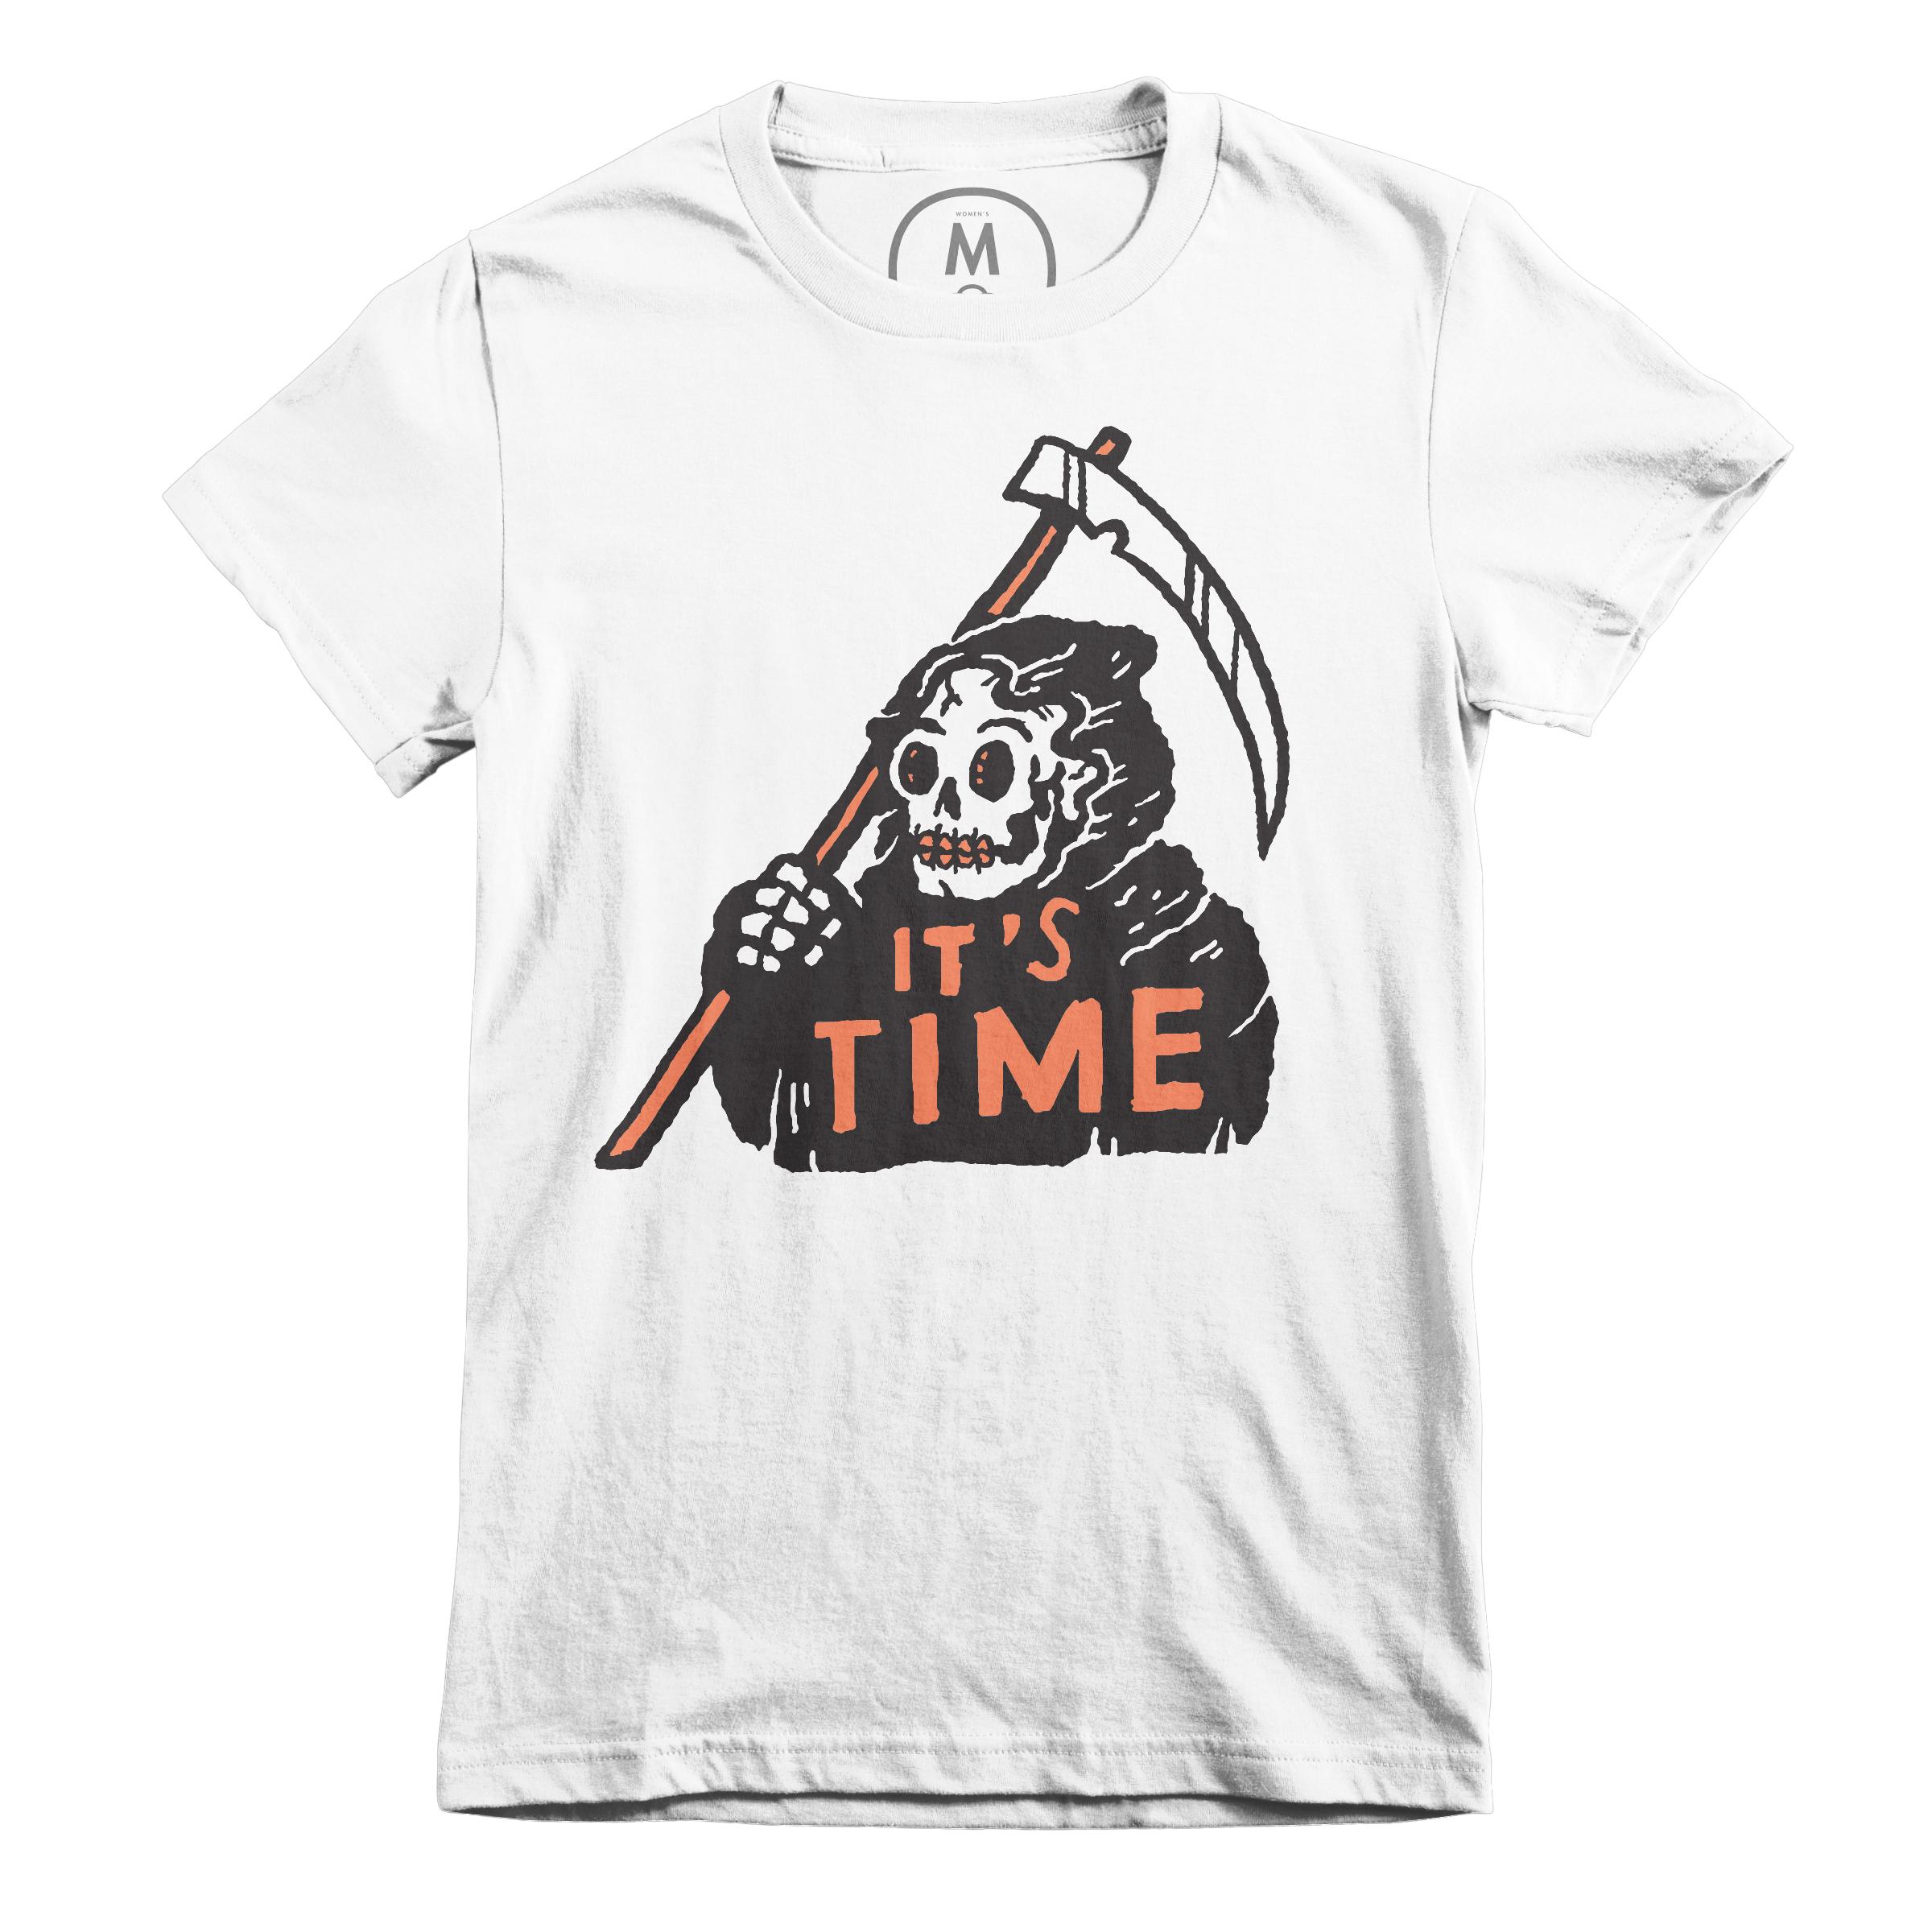 It's Time White (Women's)